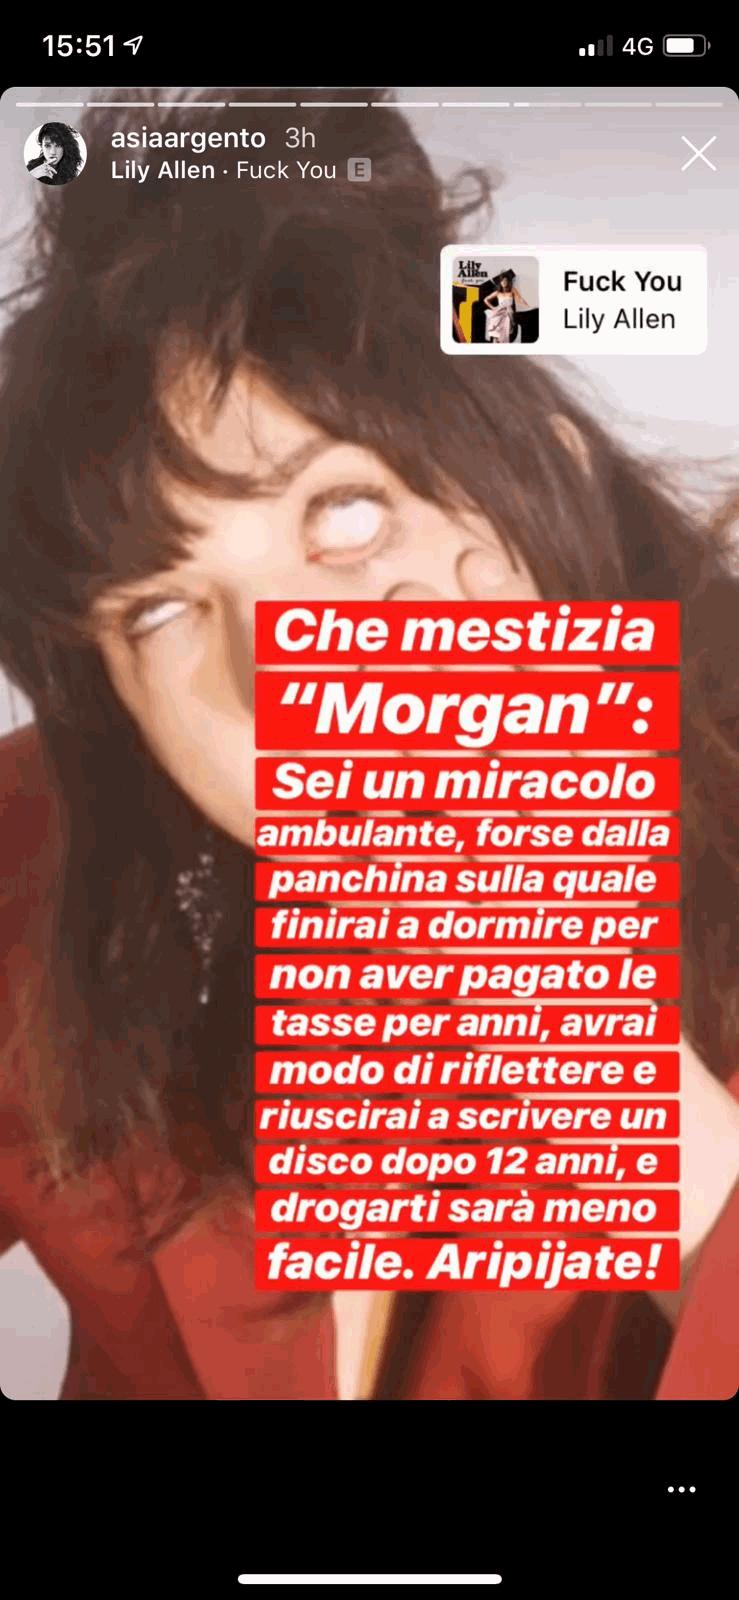 La risposta social di Asia Argento a Morgan